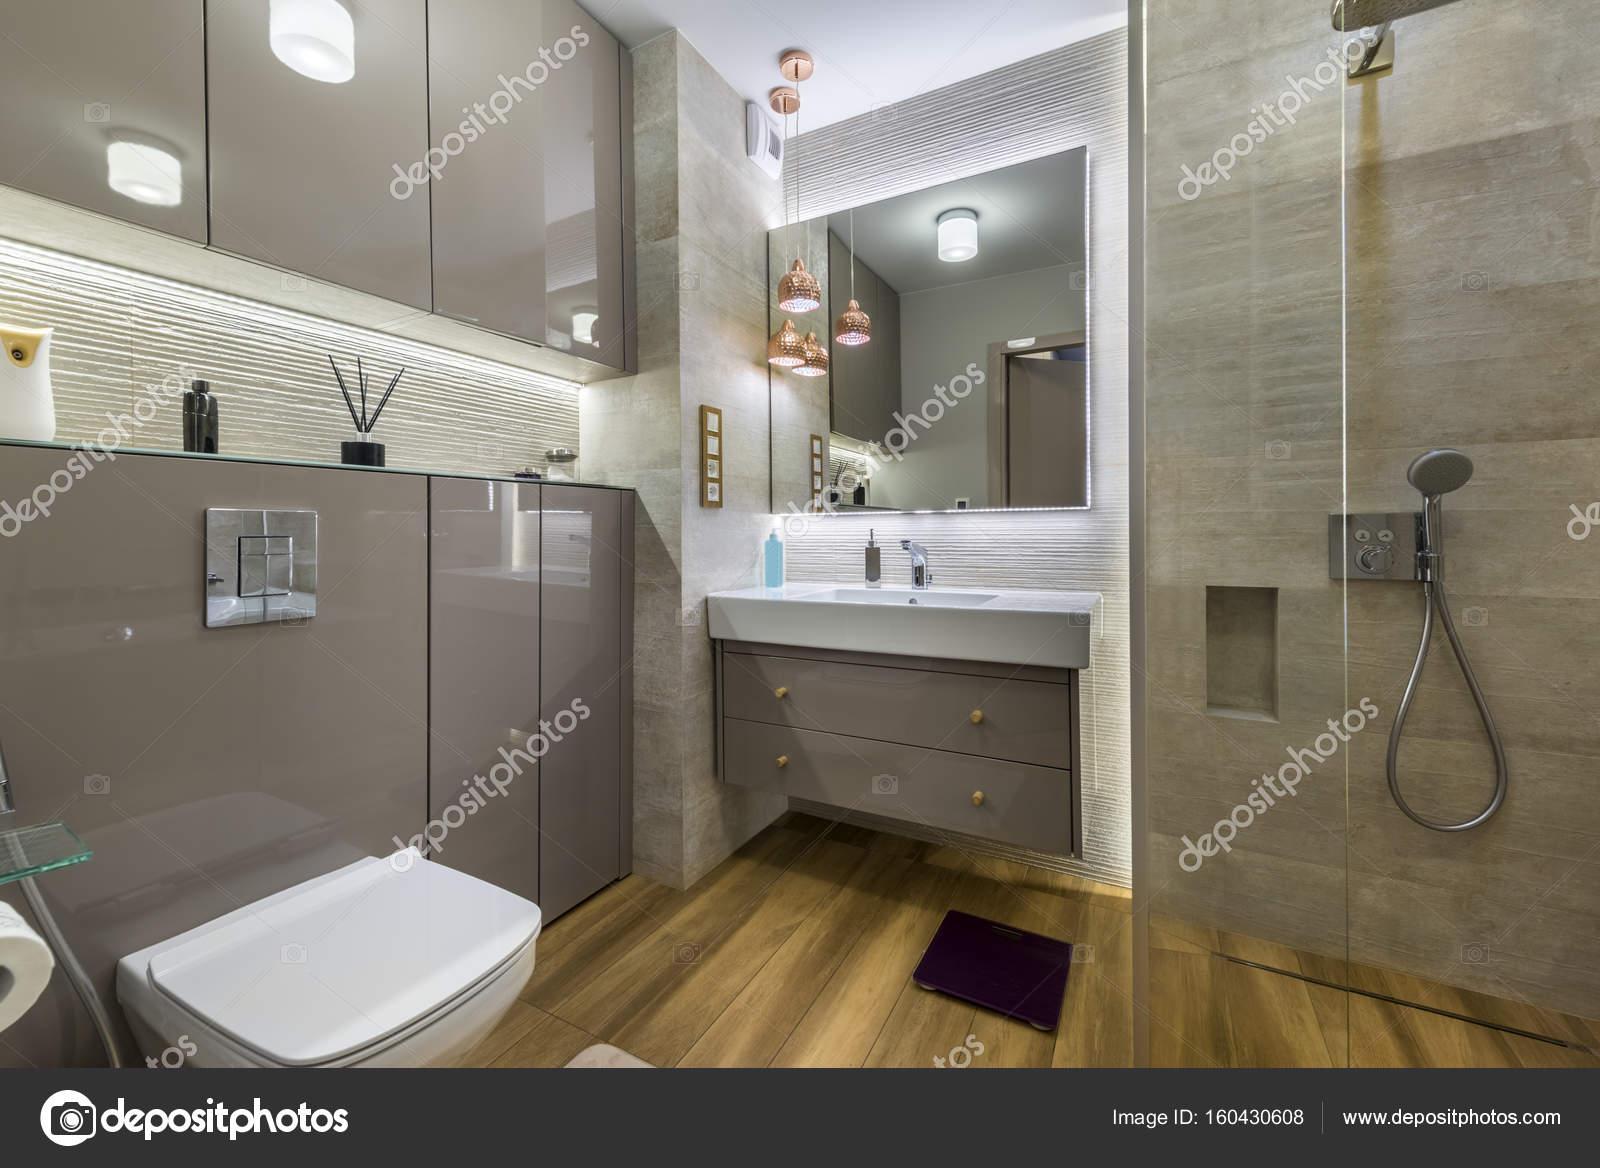 Moderne badkamer met houten vloer u2014 stockfoto © jacek kadaj #160430608